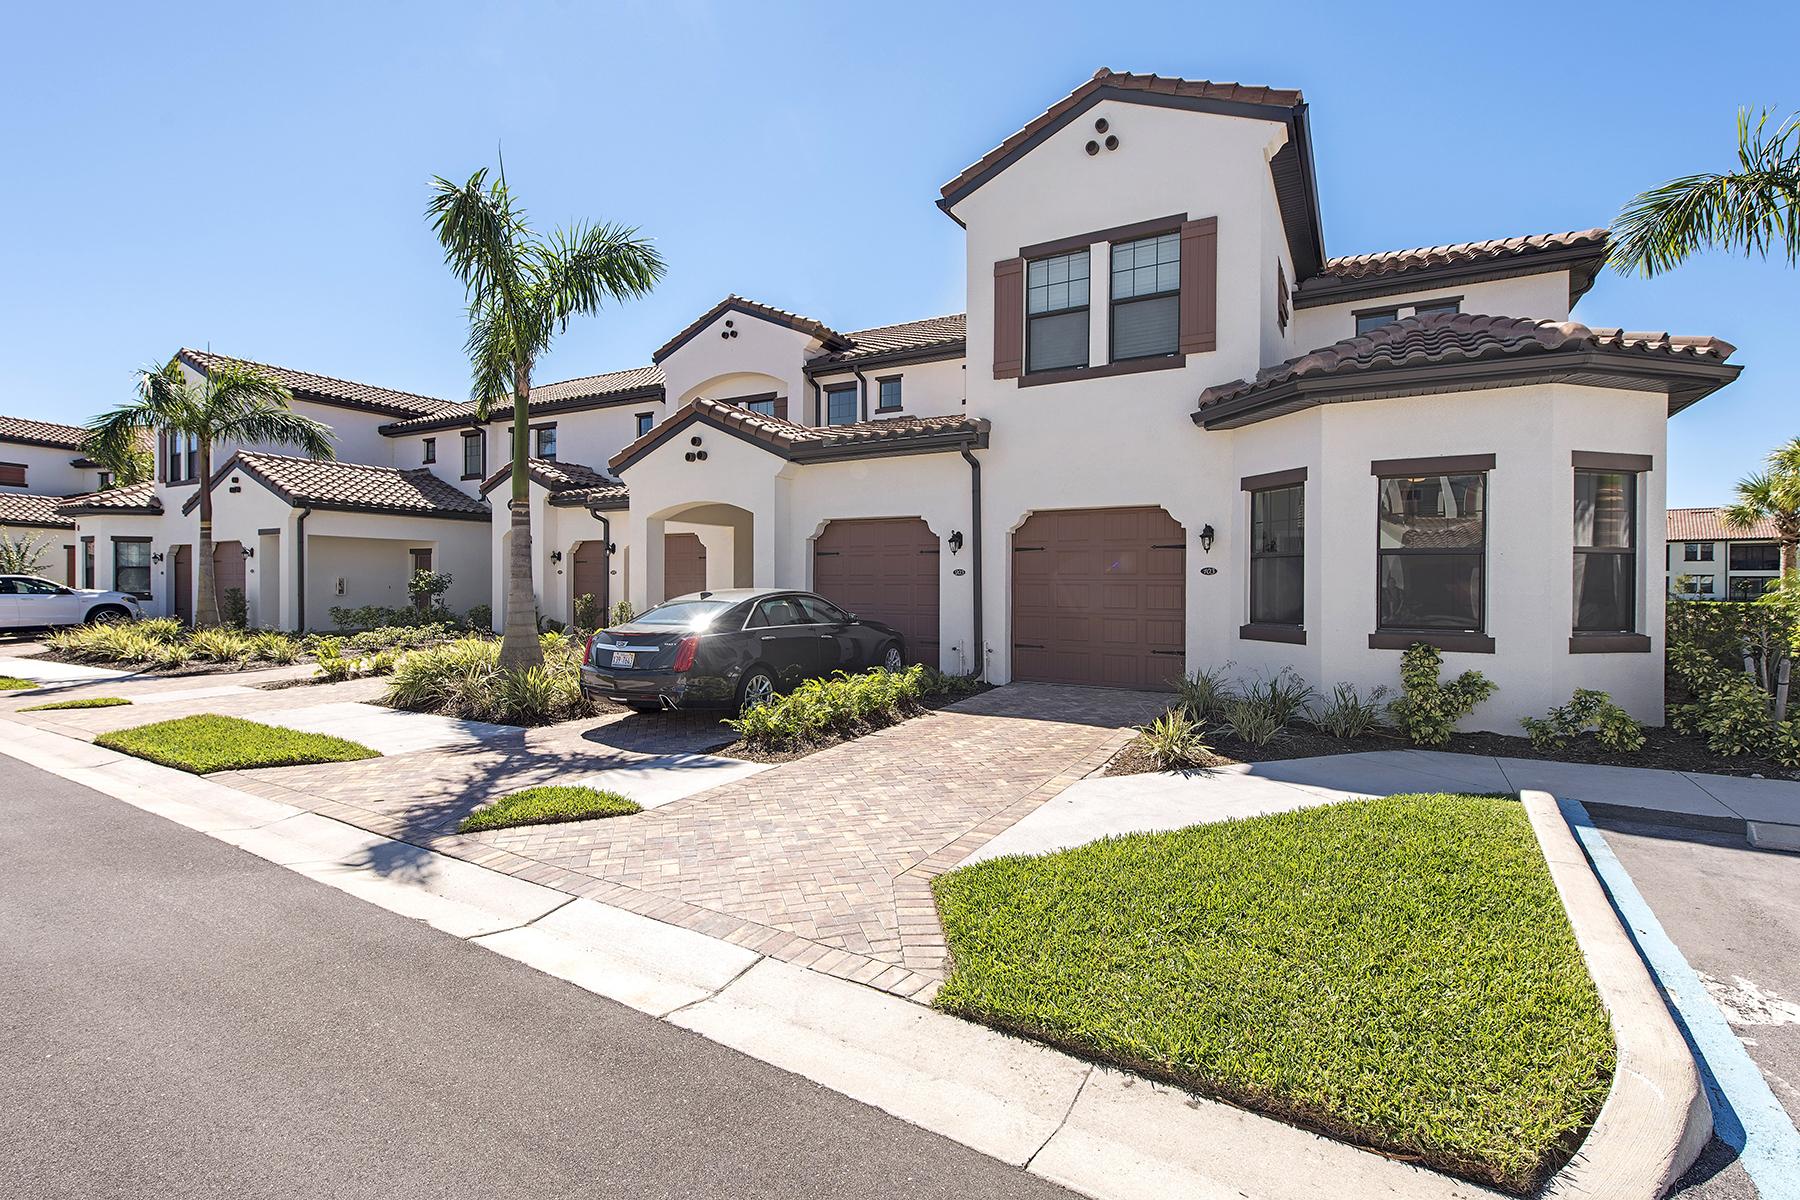 共管物業 為 出售 在 COACH HOMES AT LIVINGSTON LAKES 15152 Palmer Lake Cir 103 Naples, 佛羅里達州 34109 美國